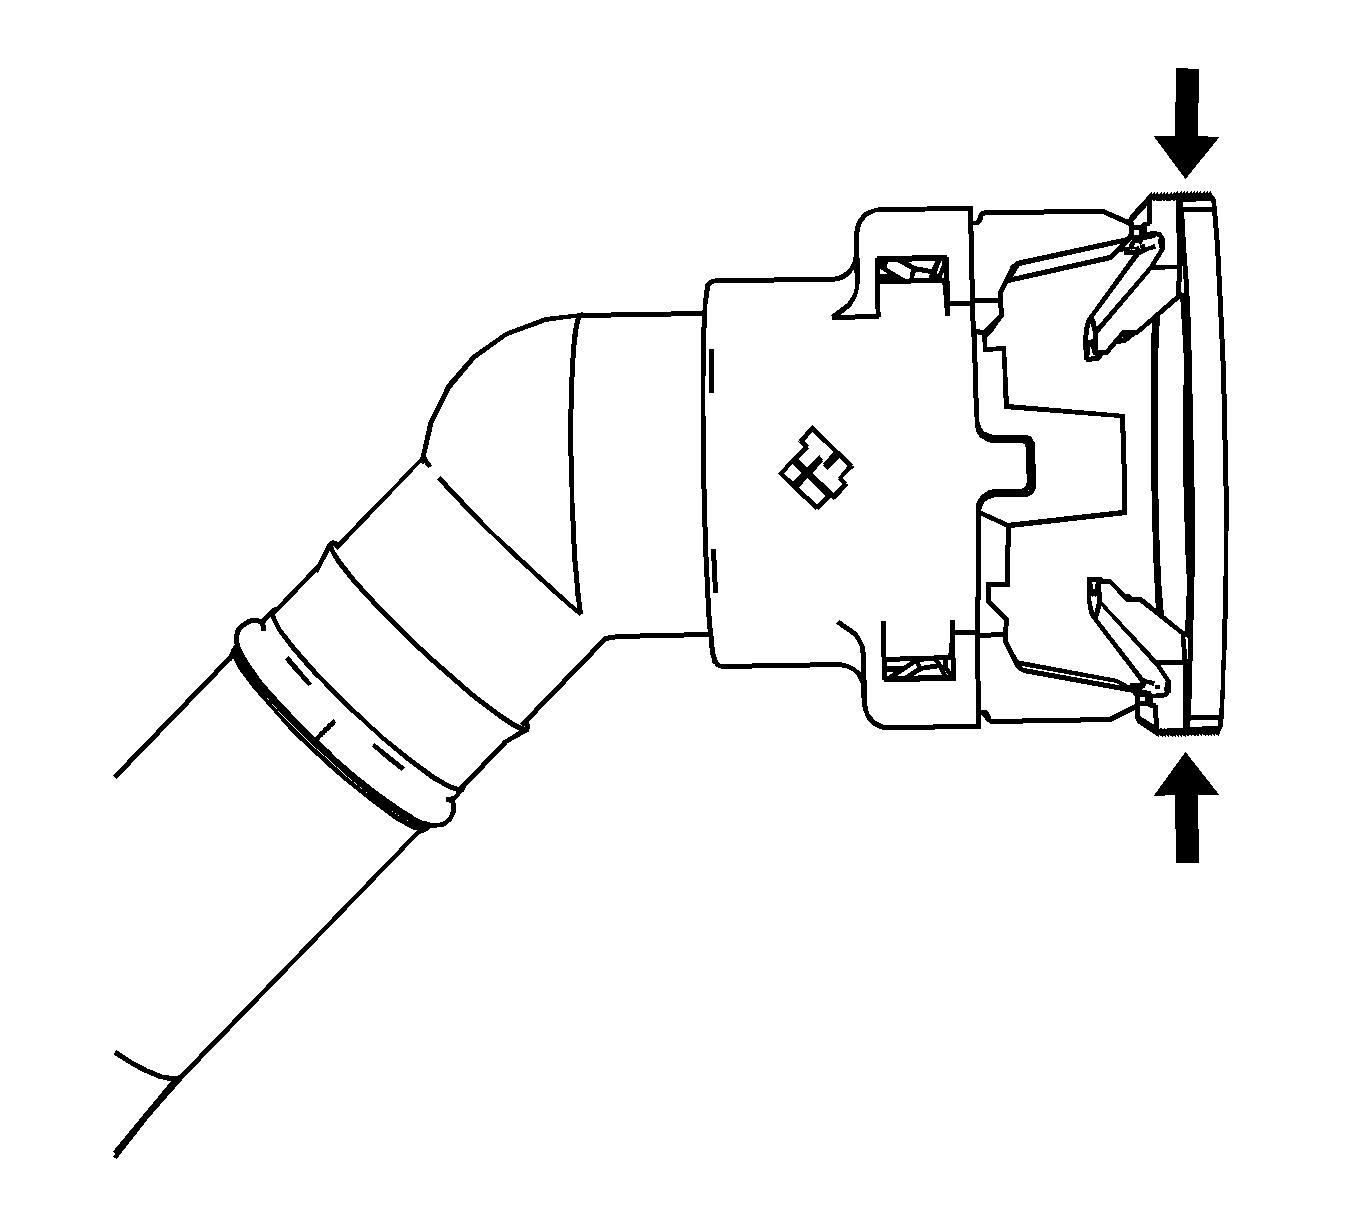 hight resolution of 1995 geo prizm engine diagram starter